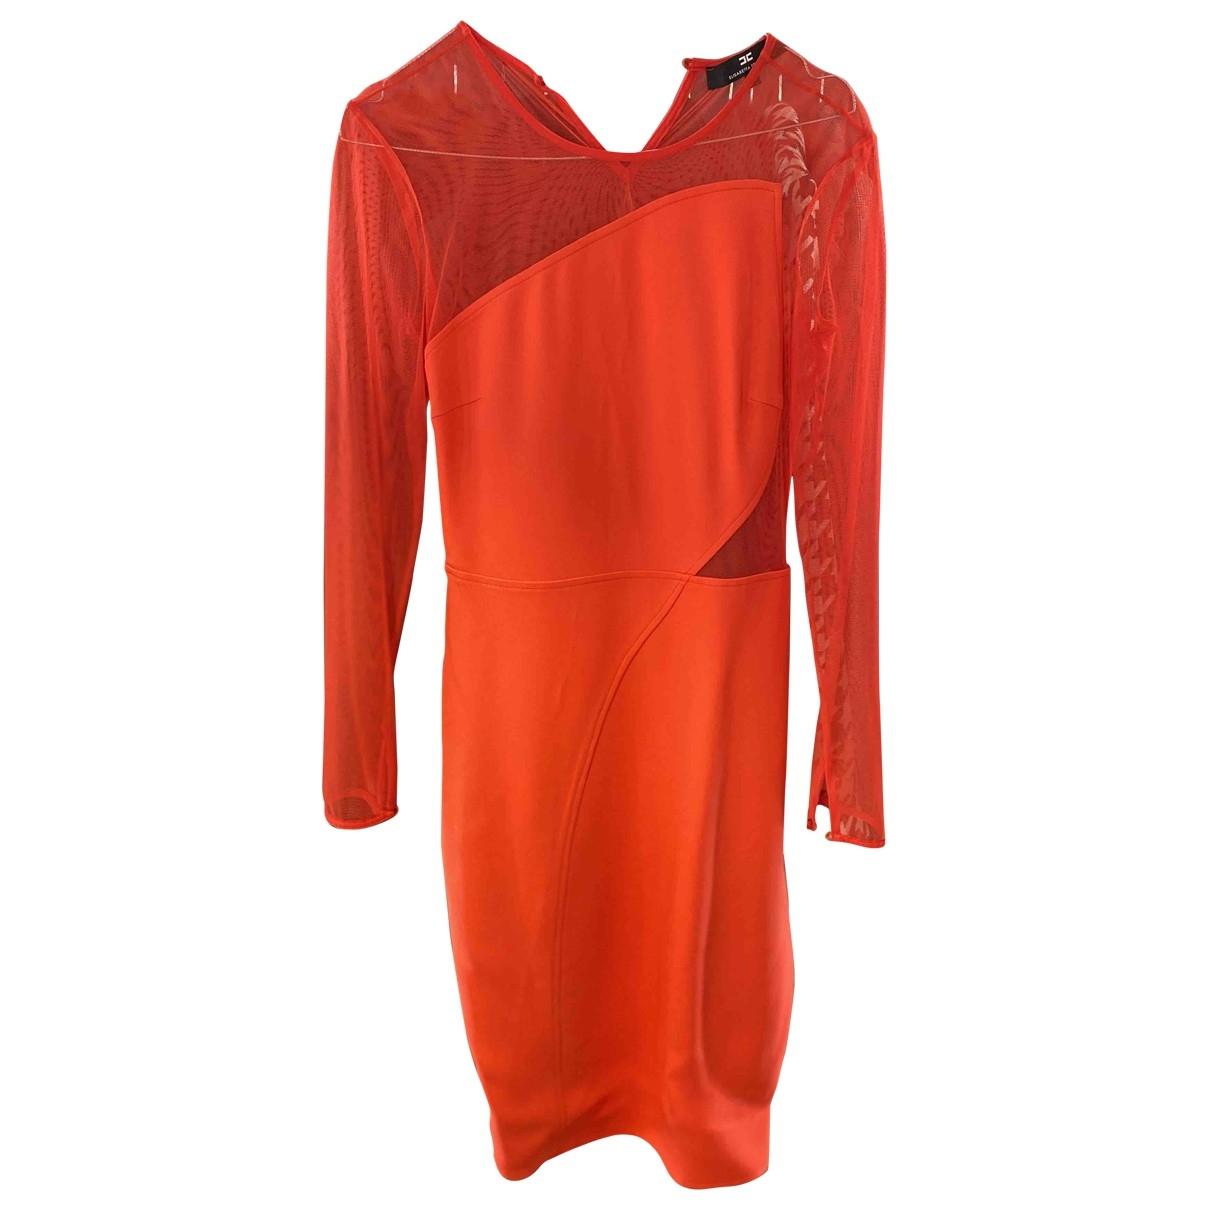 Elisabetta Franchi \N Kleid in  Orange Polyester